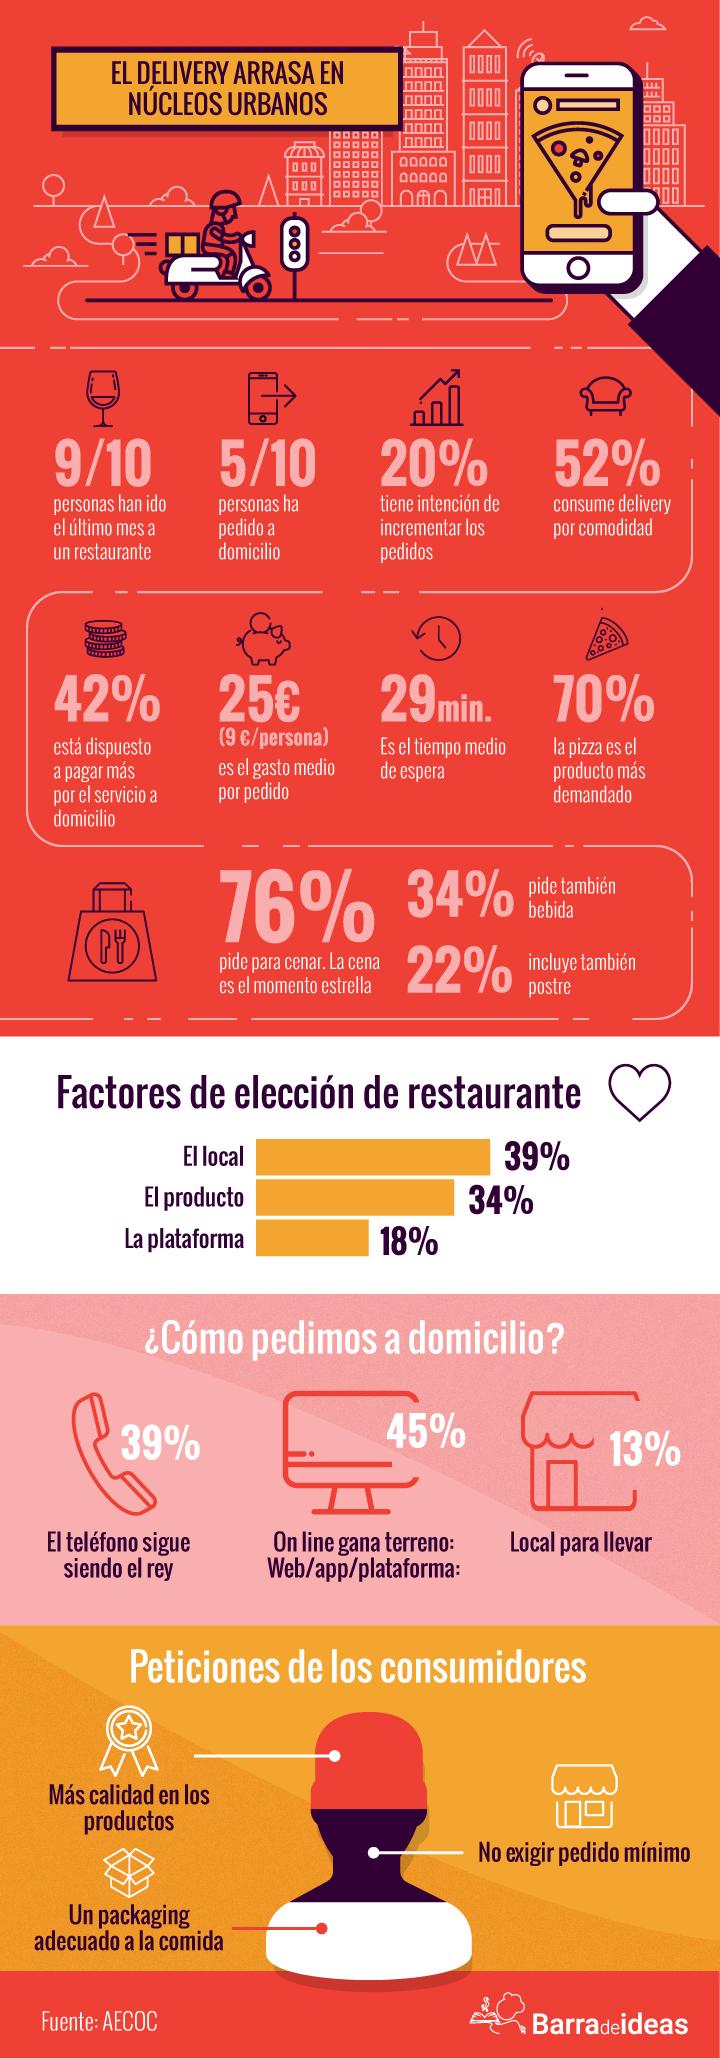 infografia_delivery (1)